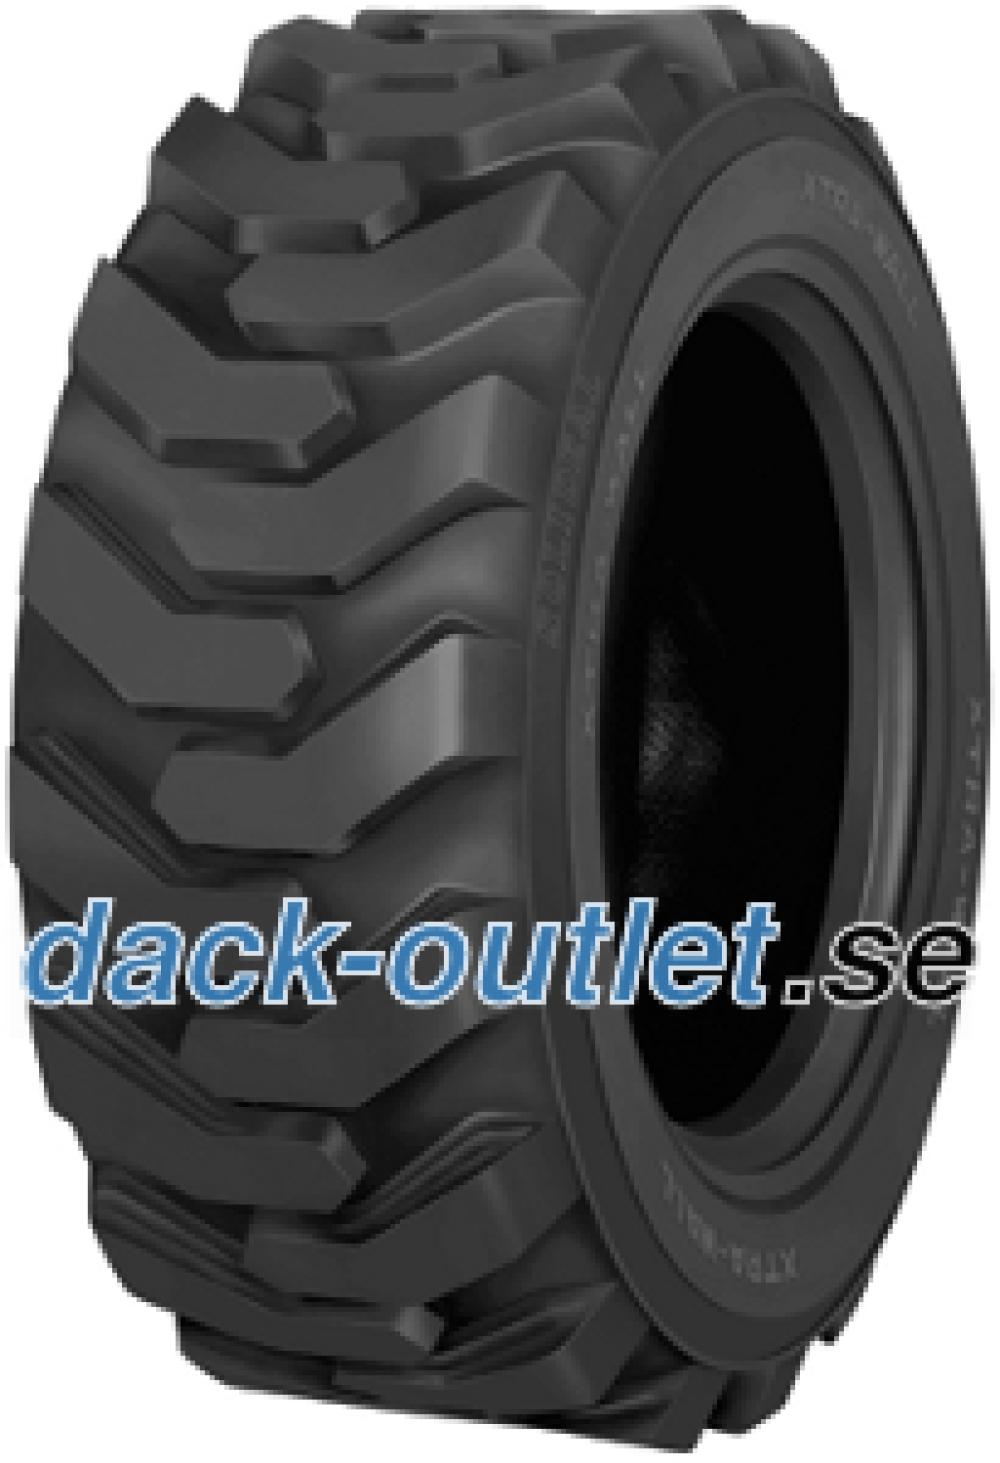 Solideal Sks Xtra Wall ( 27x8.50 -15 6PR TL )